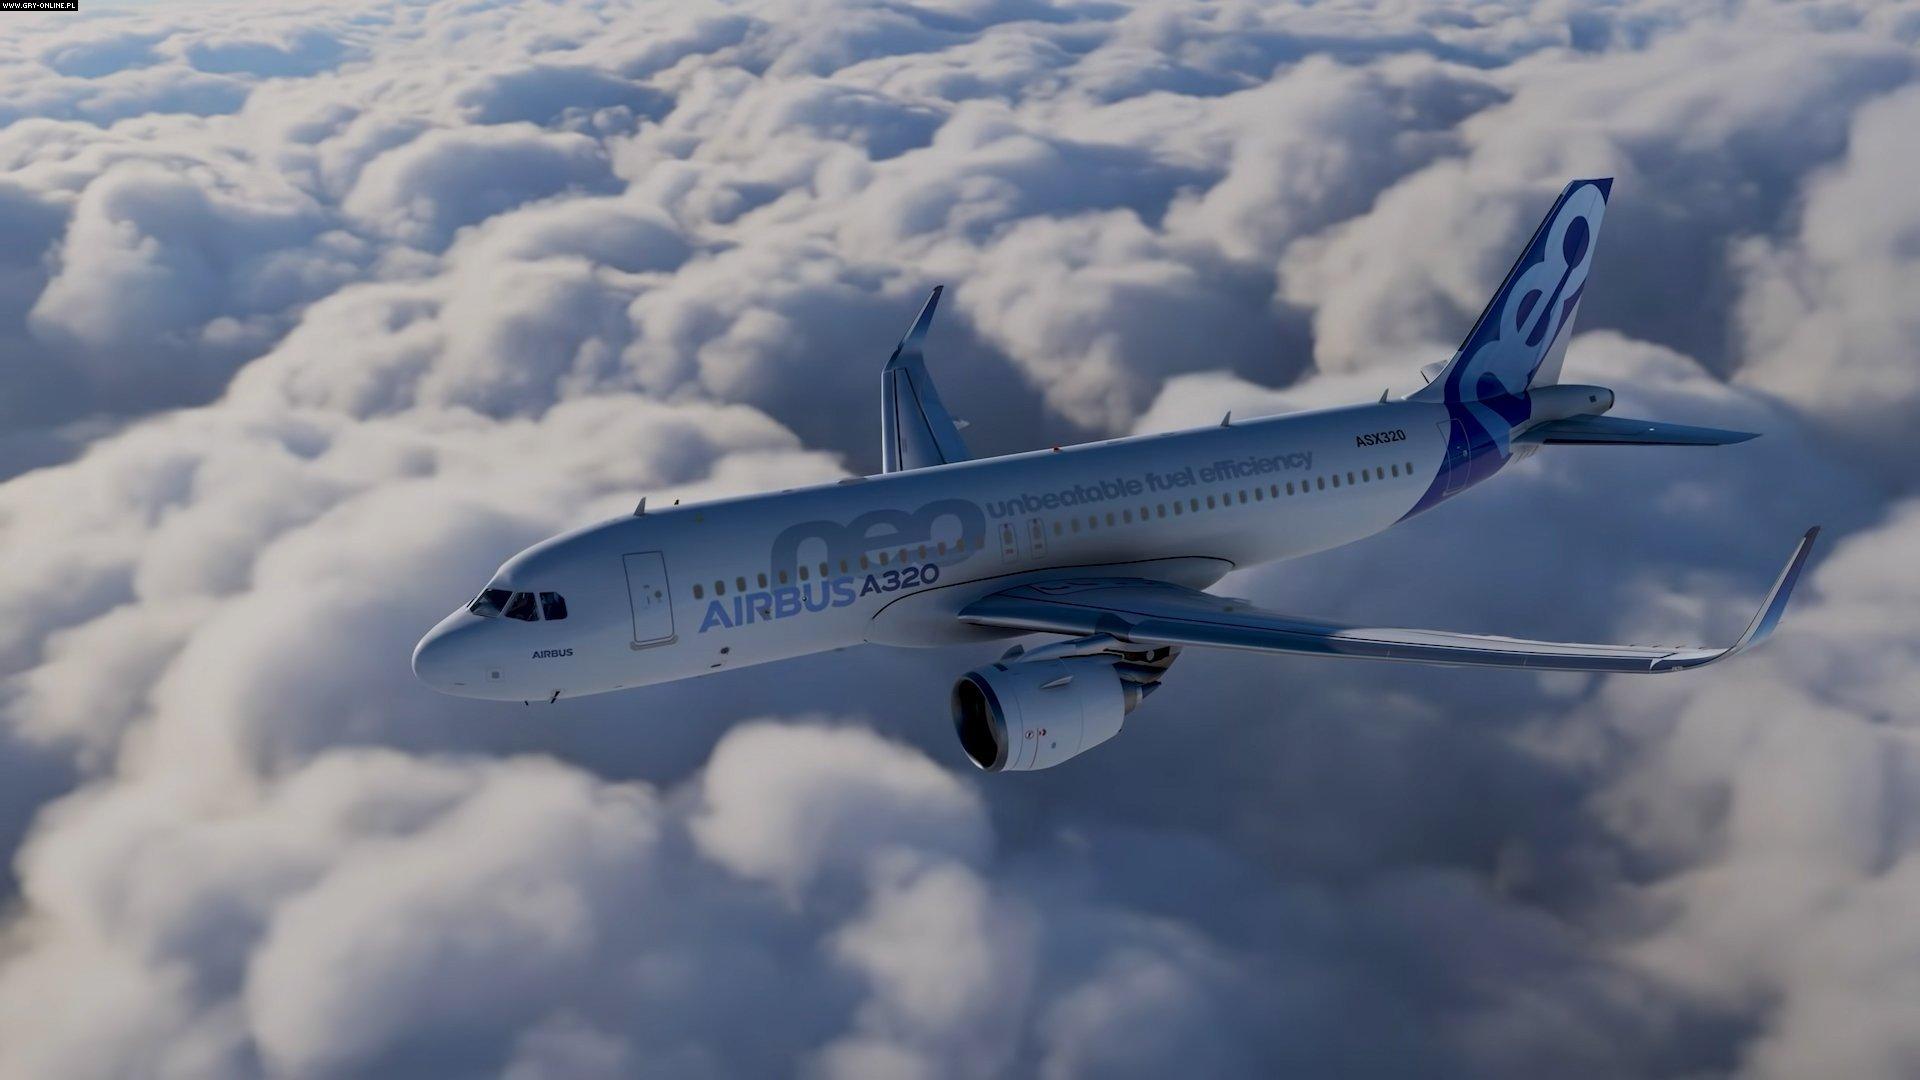 Microsoft Flight Simulator Screenshots | gamepressure.com